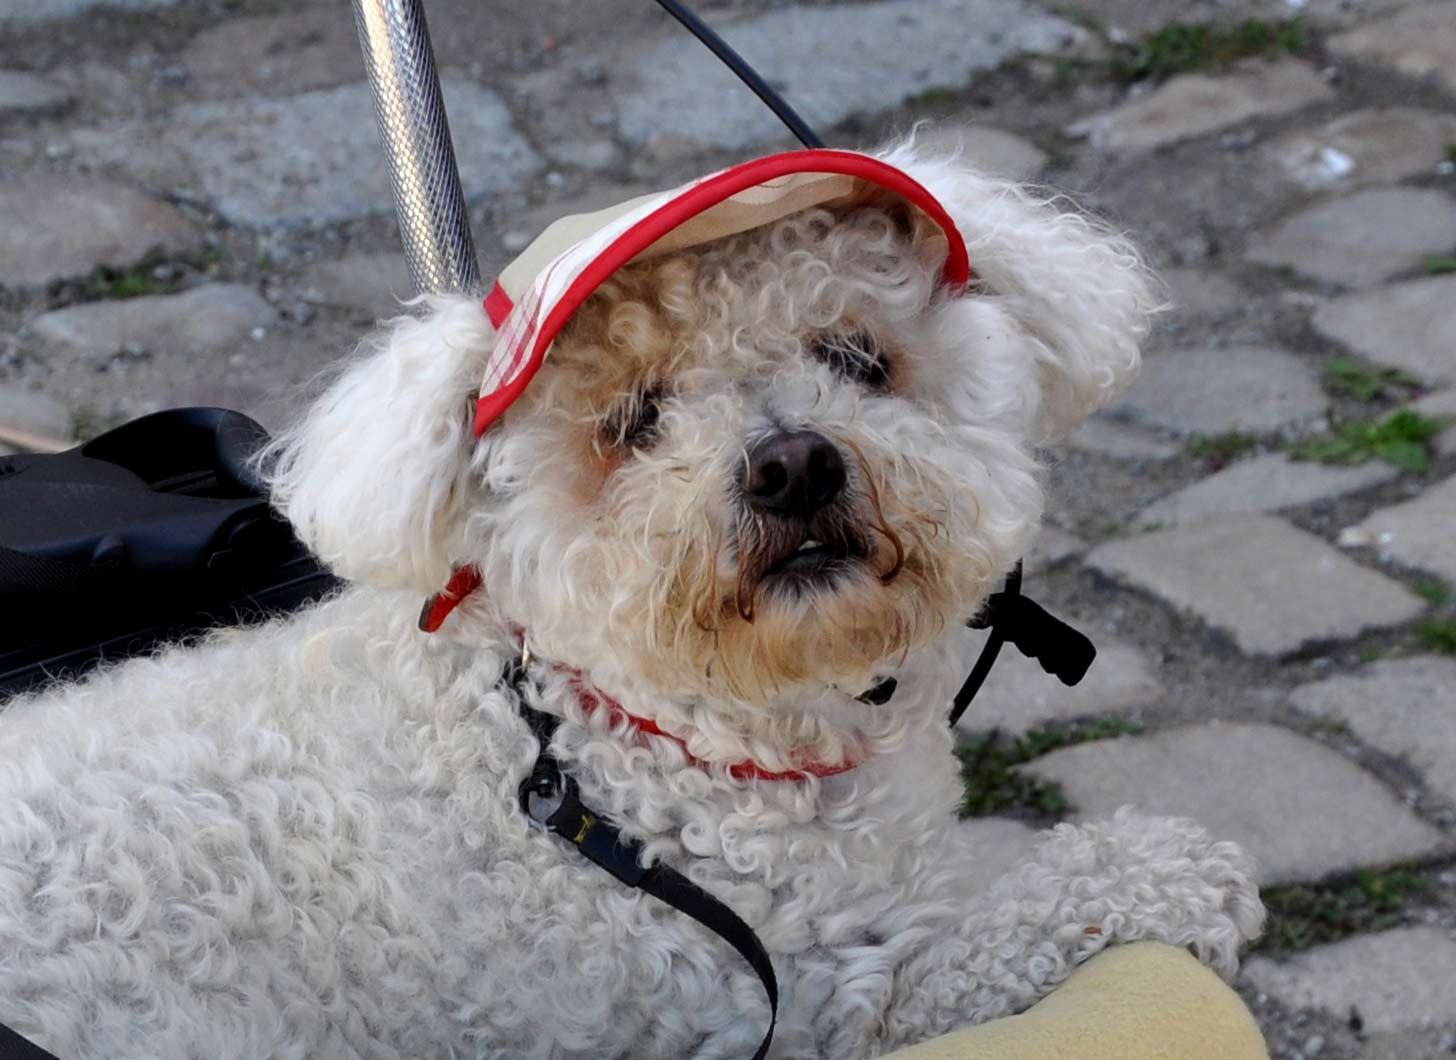 belle casquette, mignon ce chien de Bretagne